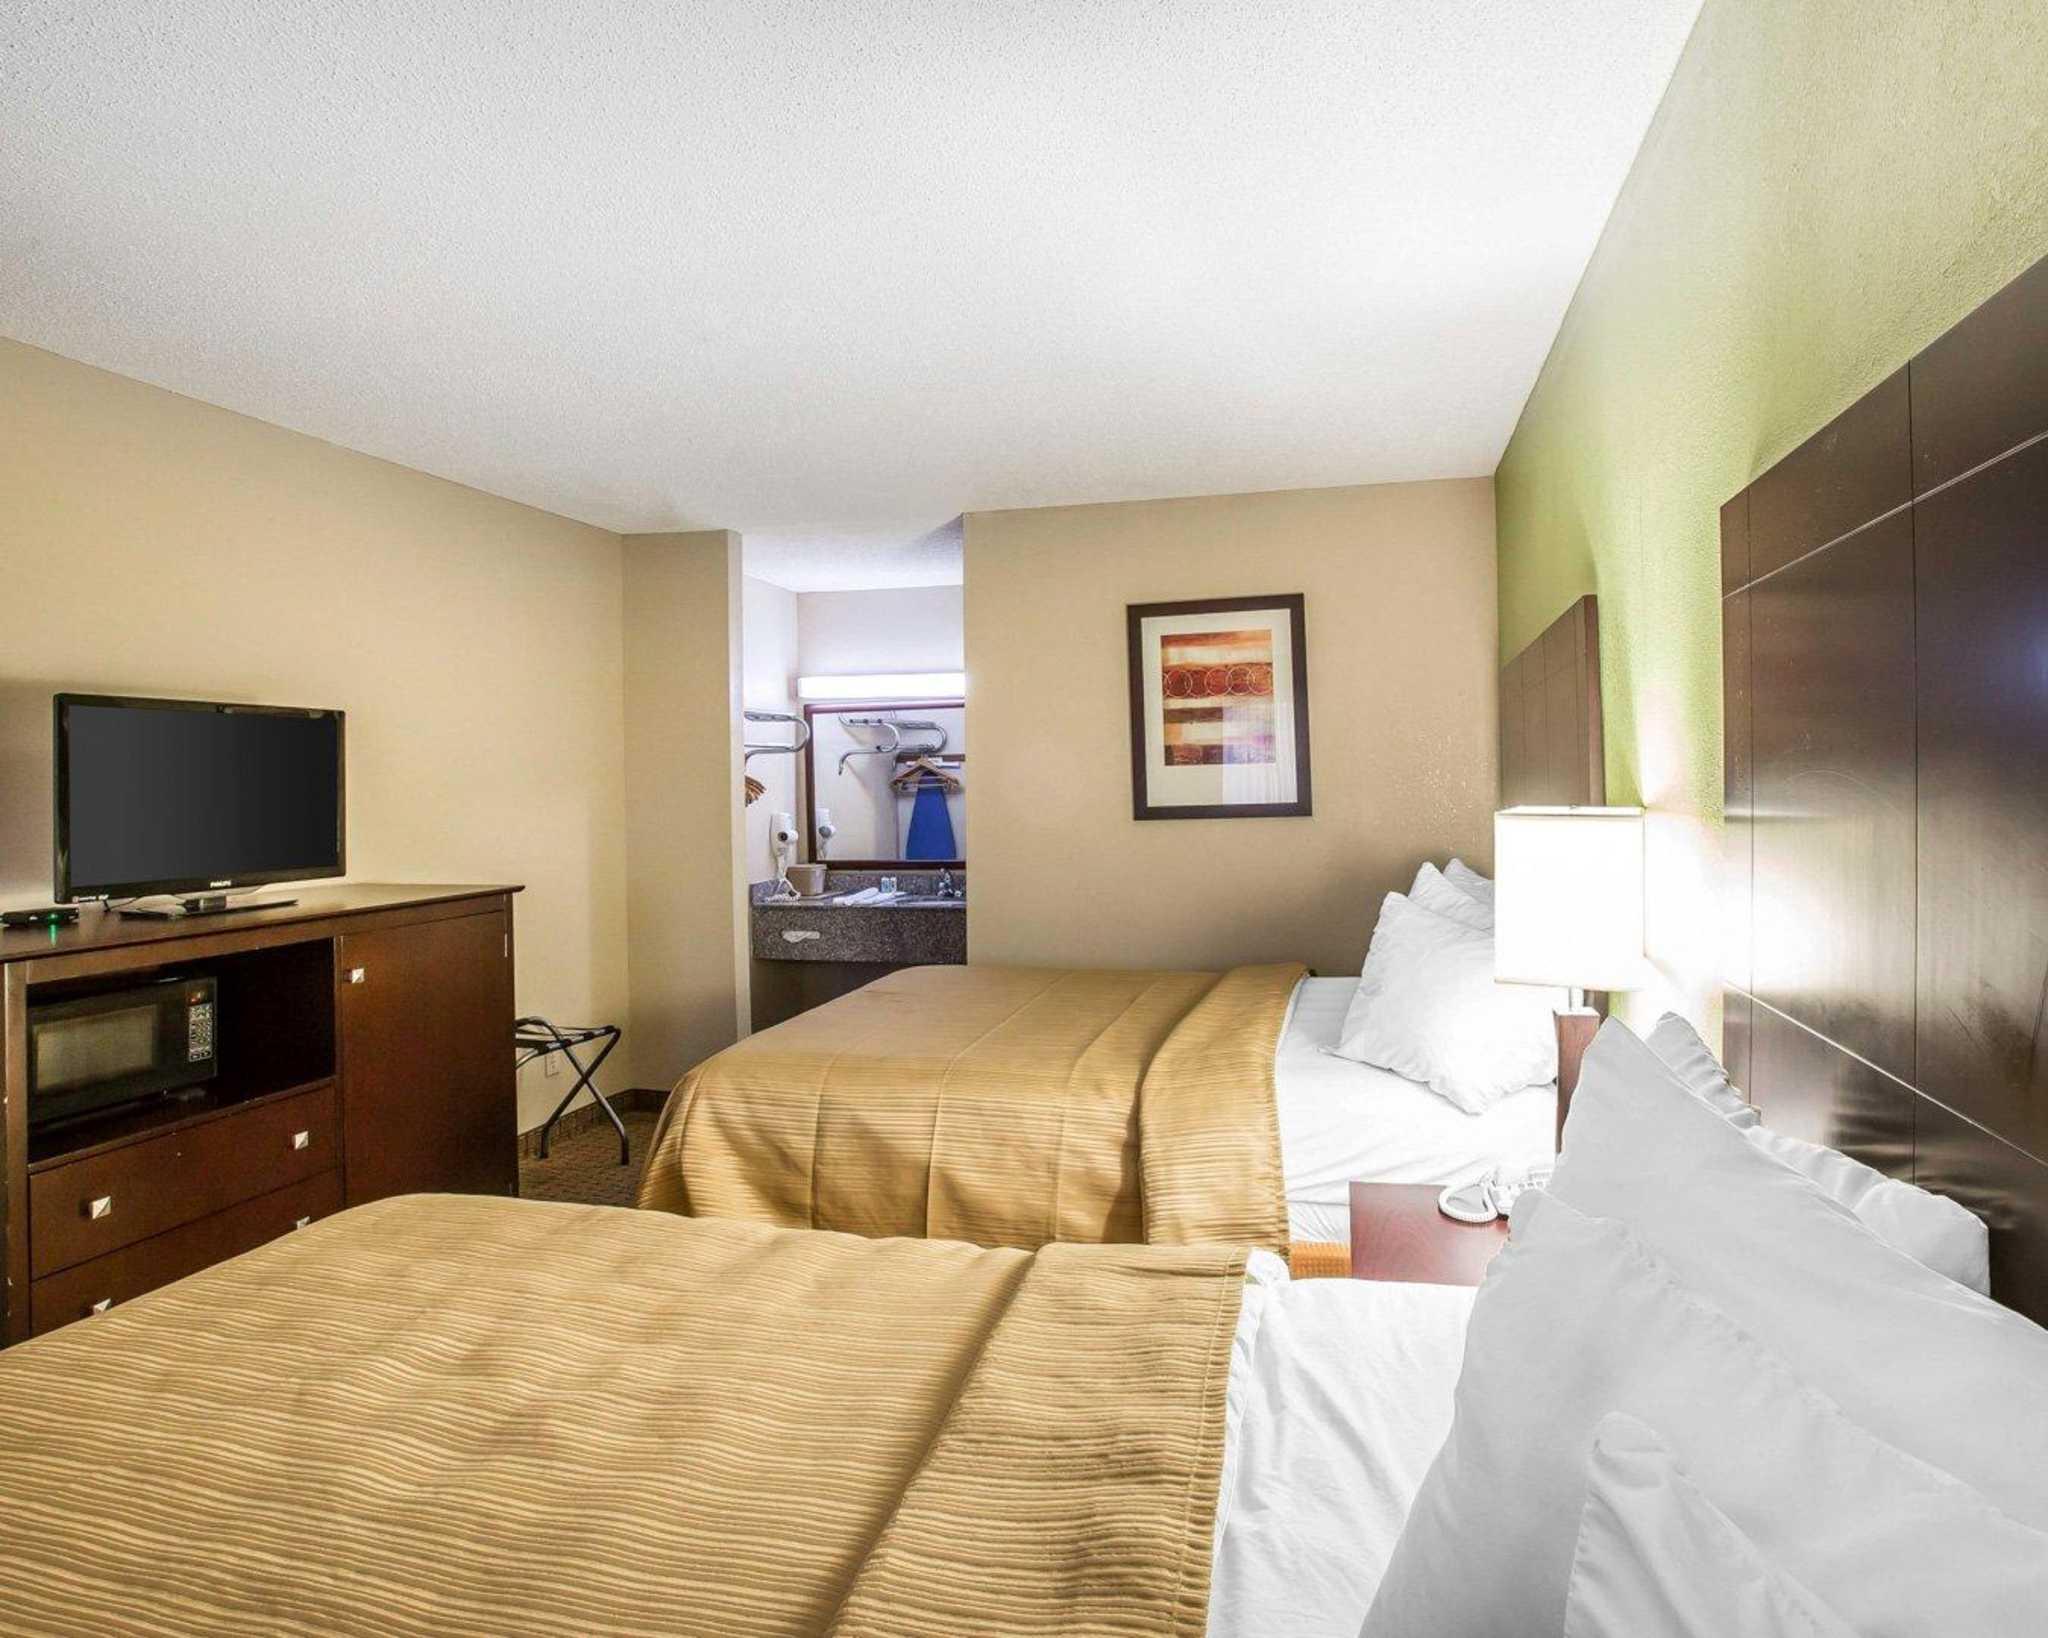 Quality Inn & Suites Dublin image 9